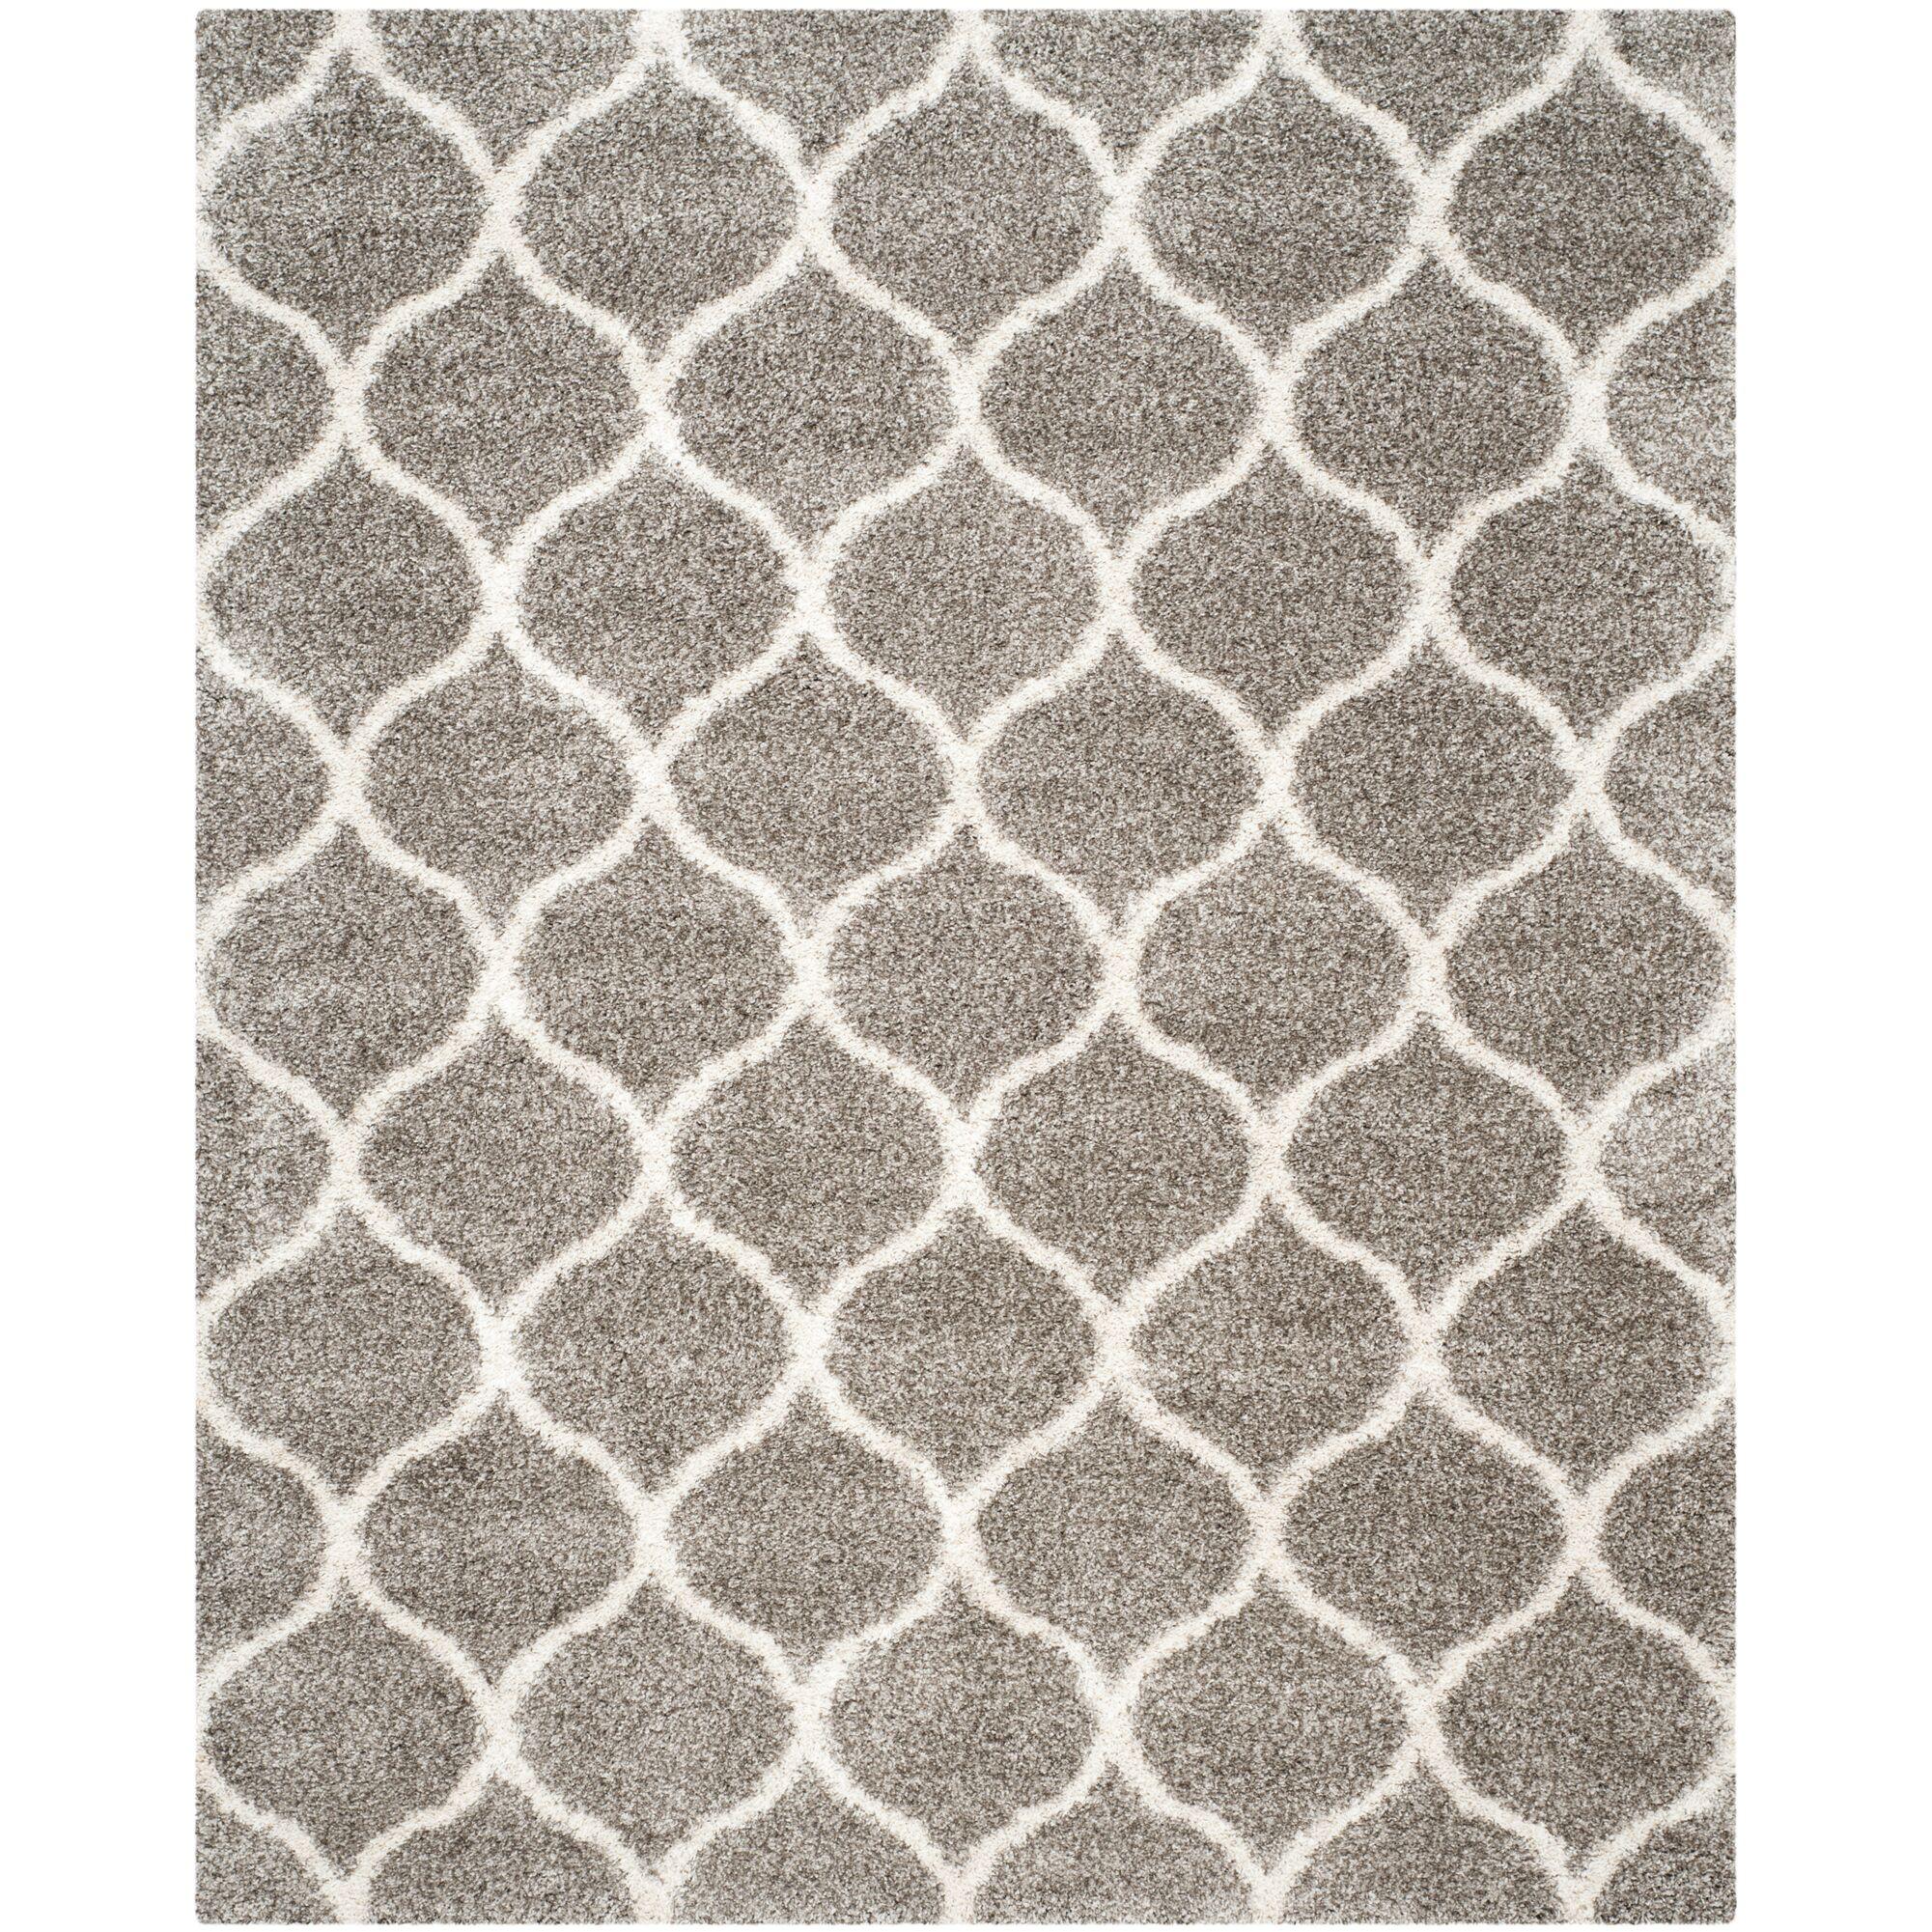 Elizabeth Street Gray/Ivory Area Rug Rug Size: Rectangle 8' x 10'